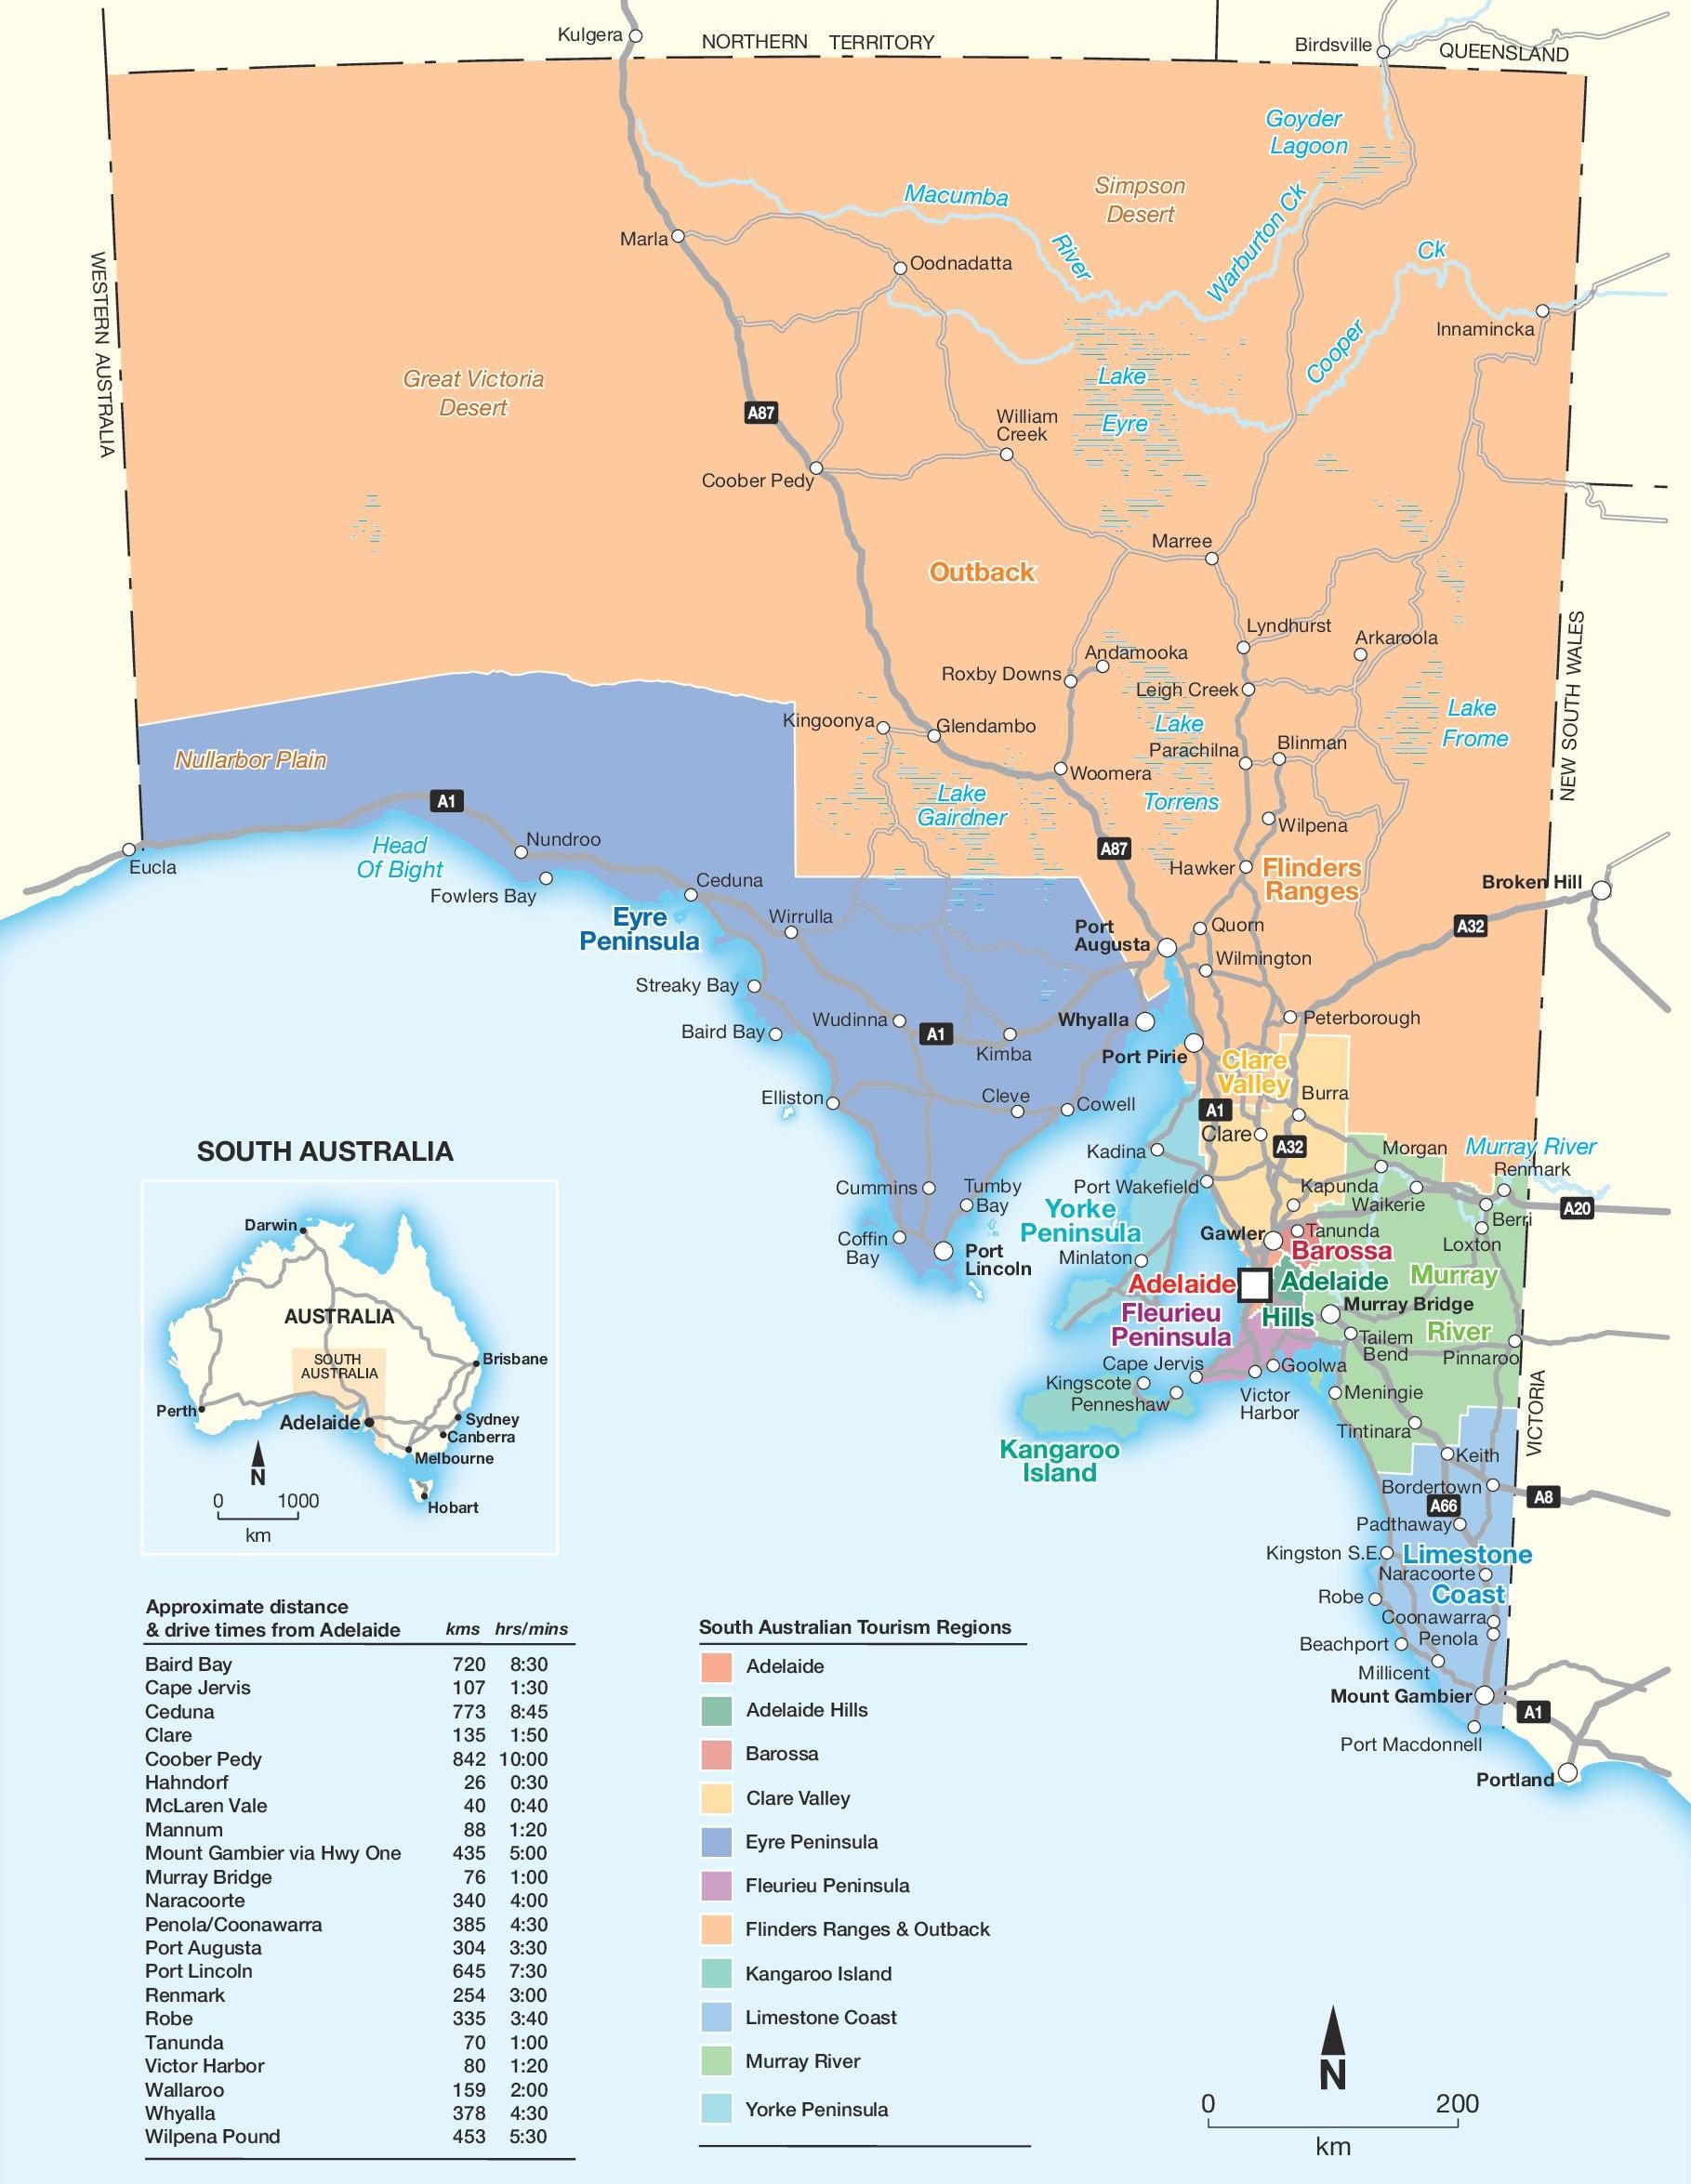 South Australia Map South Australia tourism regions map